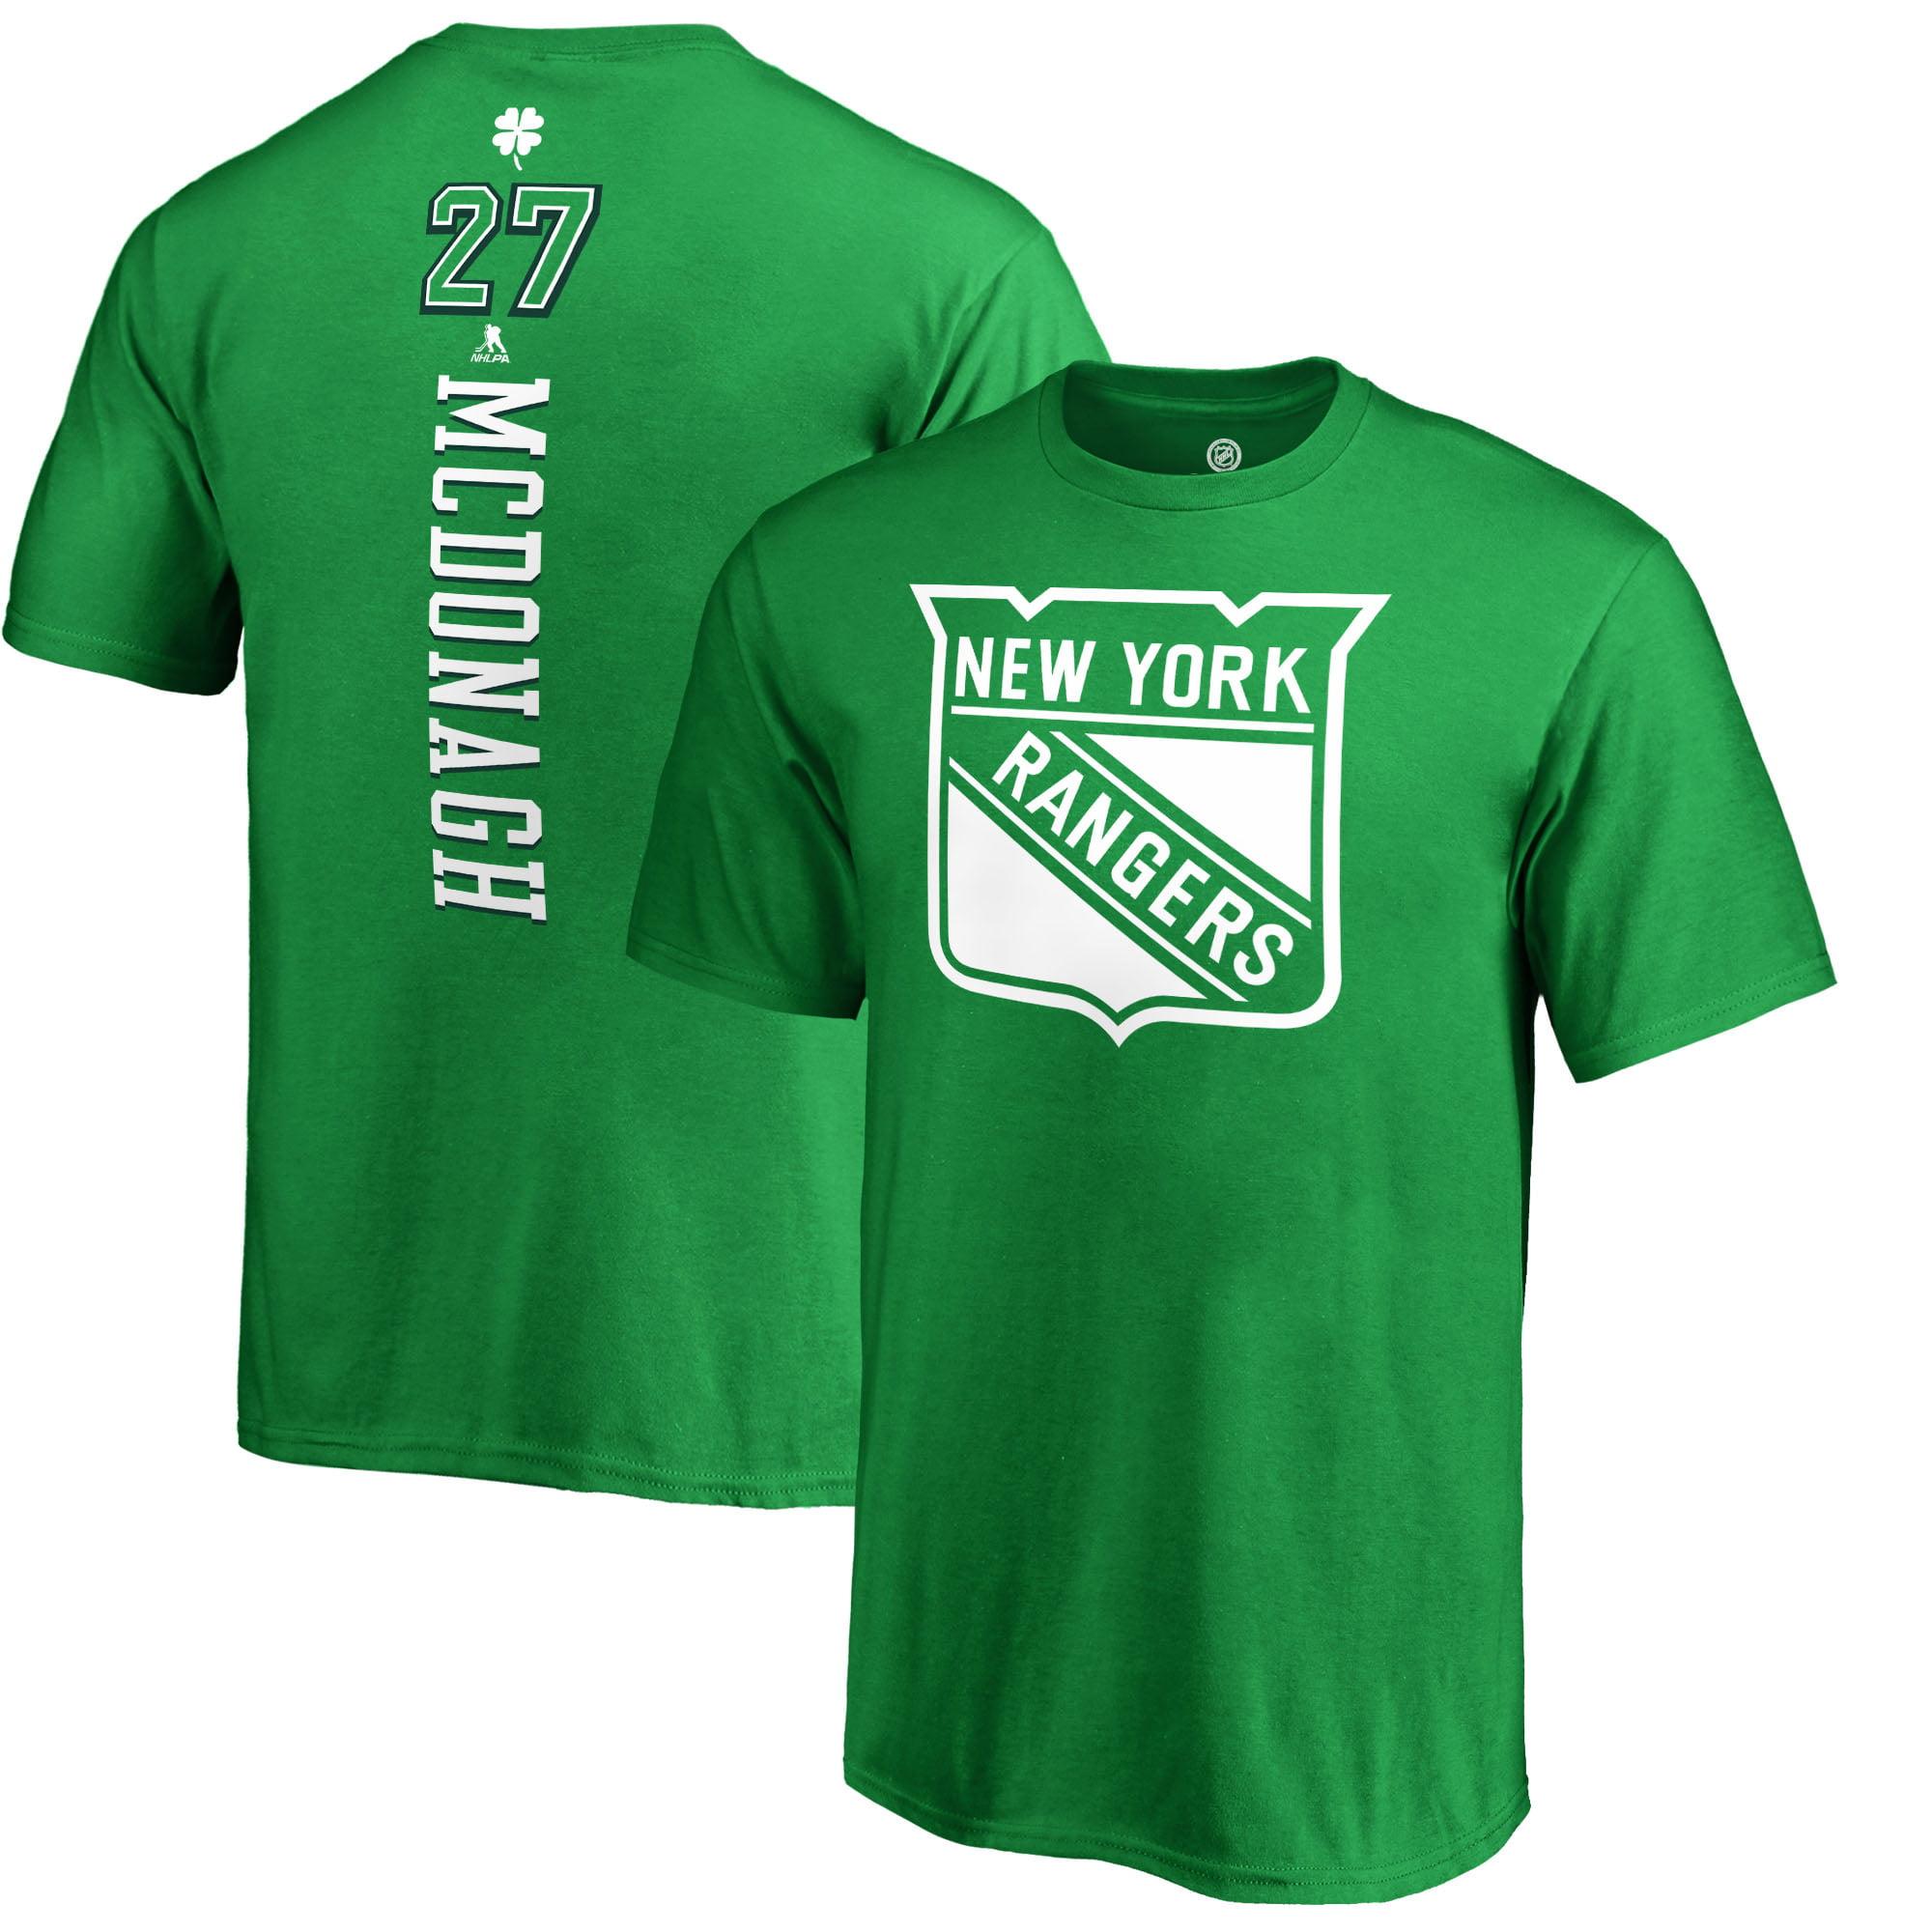 Ryan McDonagh New York Rangers Fanatics Branded Youth St. Patrick's Day Backer Name & Number T-Shirt - Kelly Green